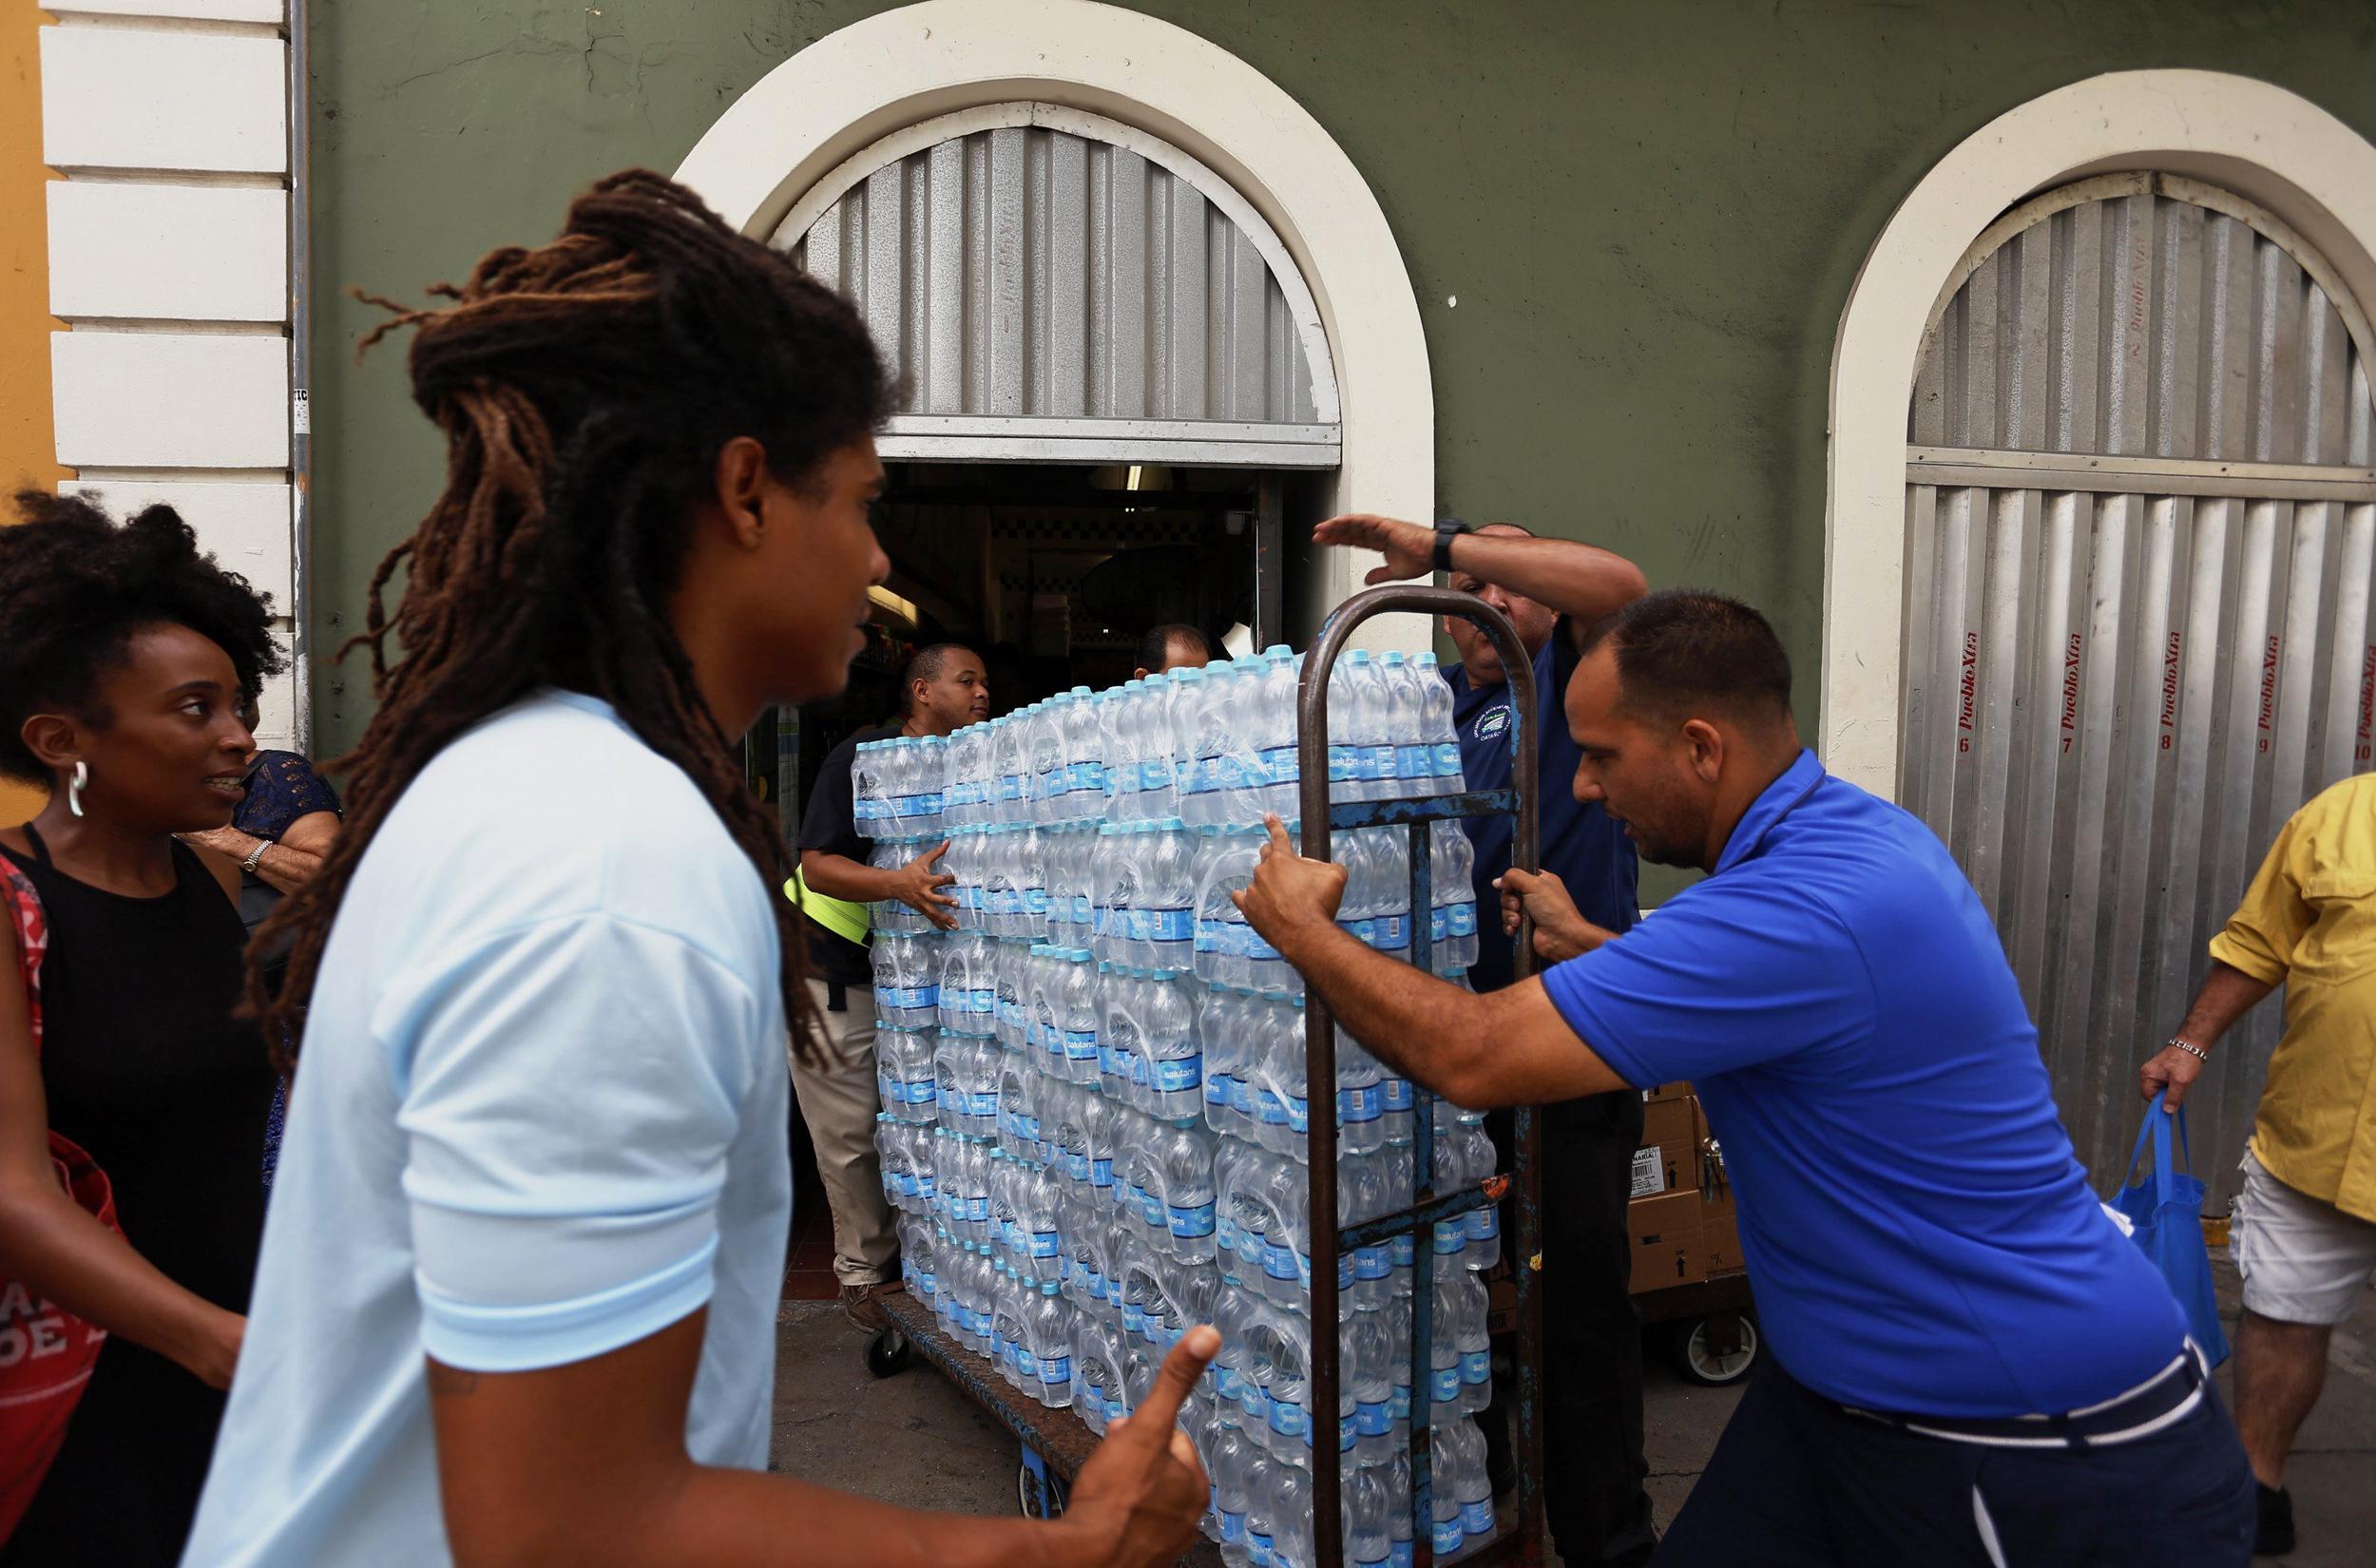 Image: Puerto Rico takes measures ahead of Irma's Hurricane passsage